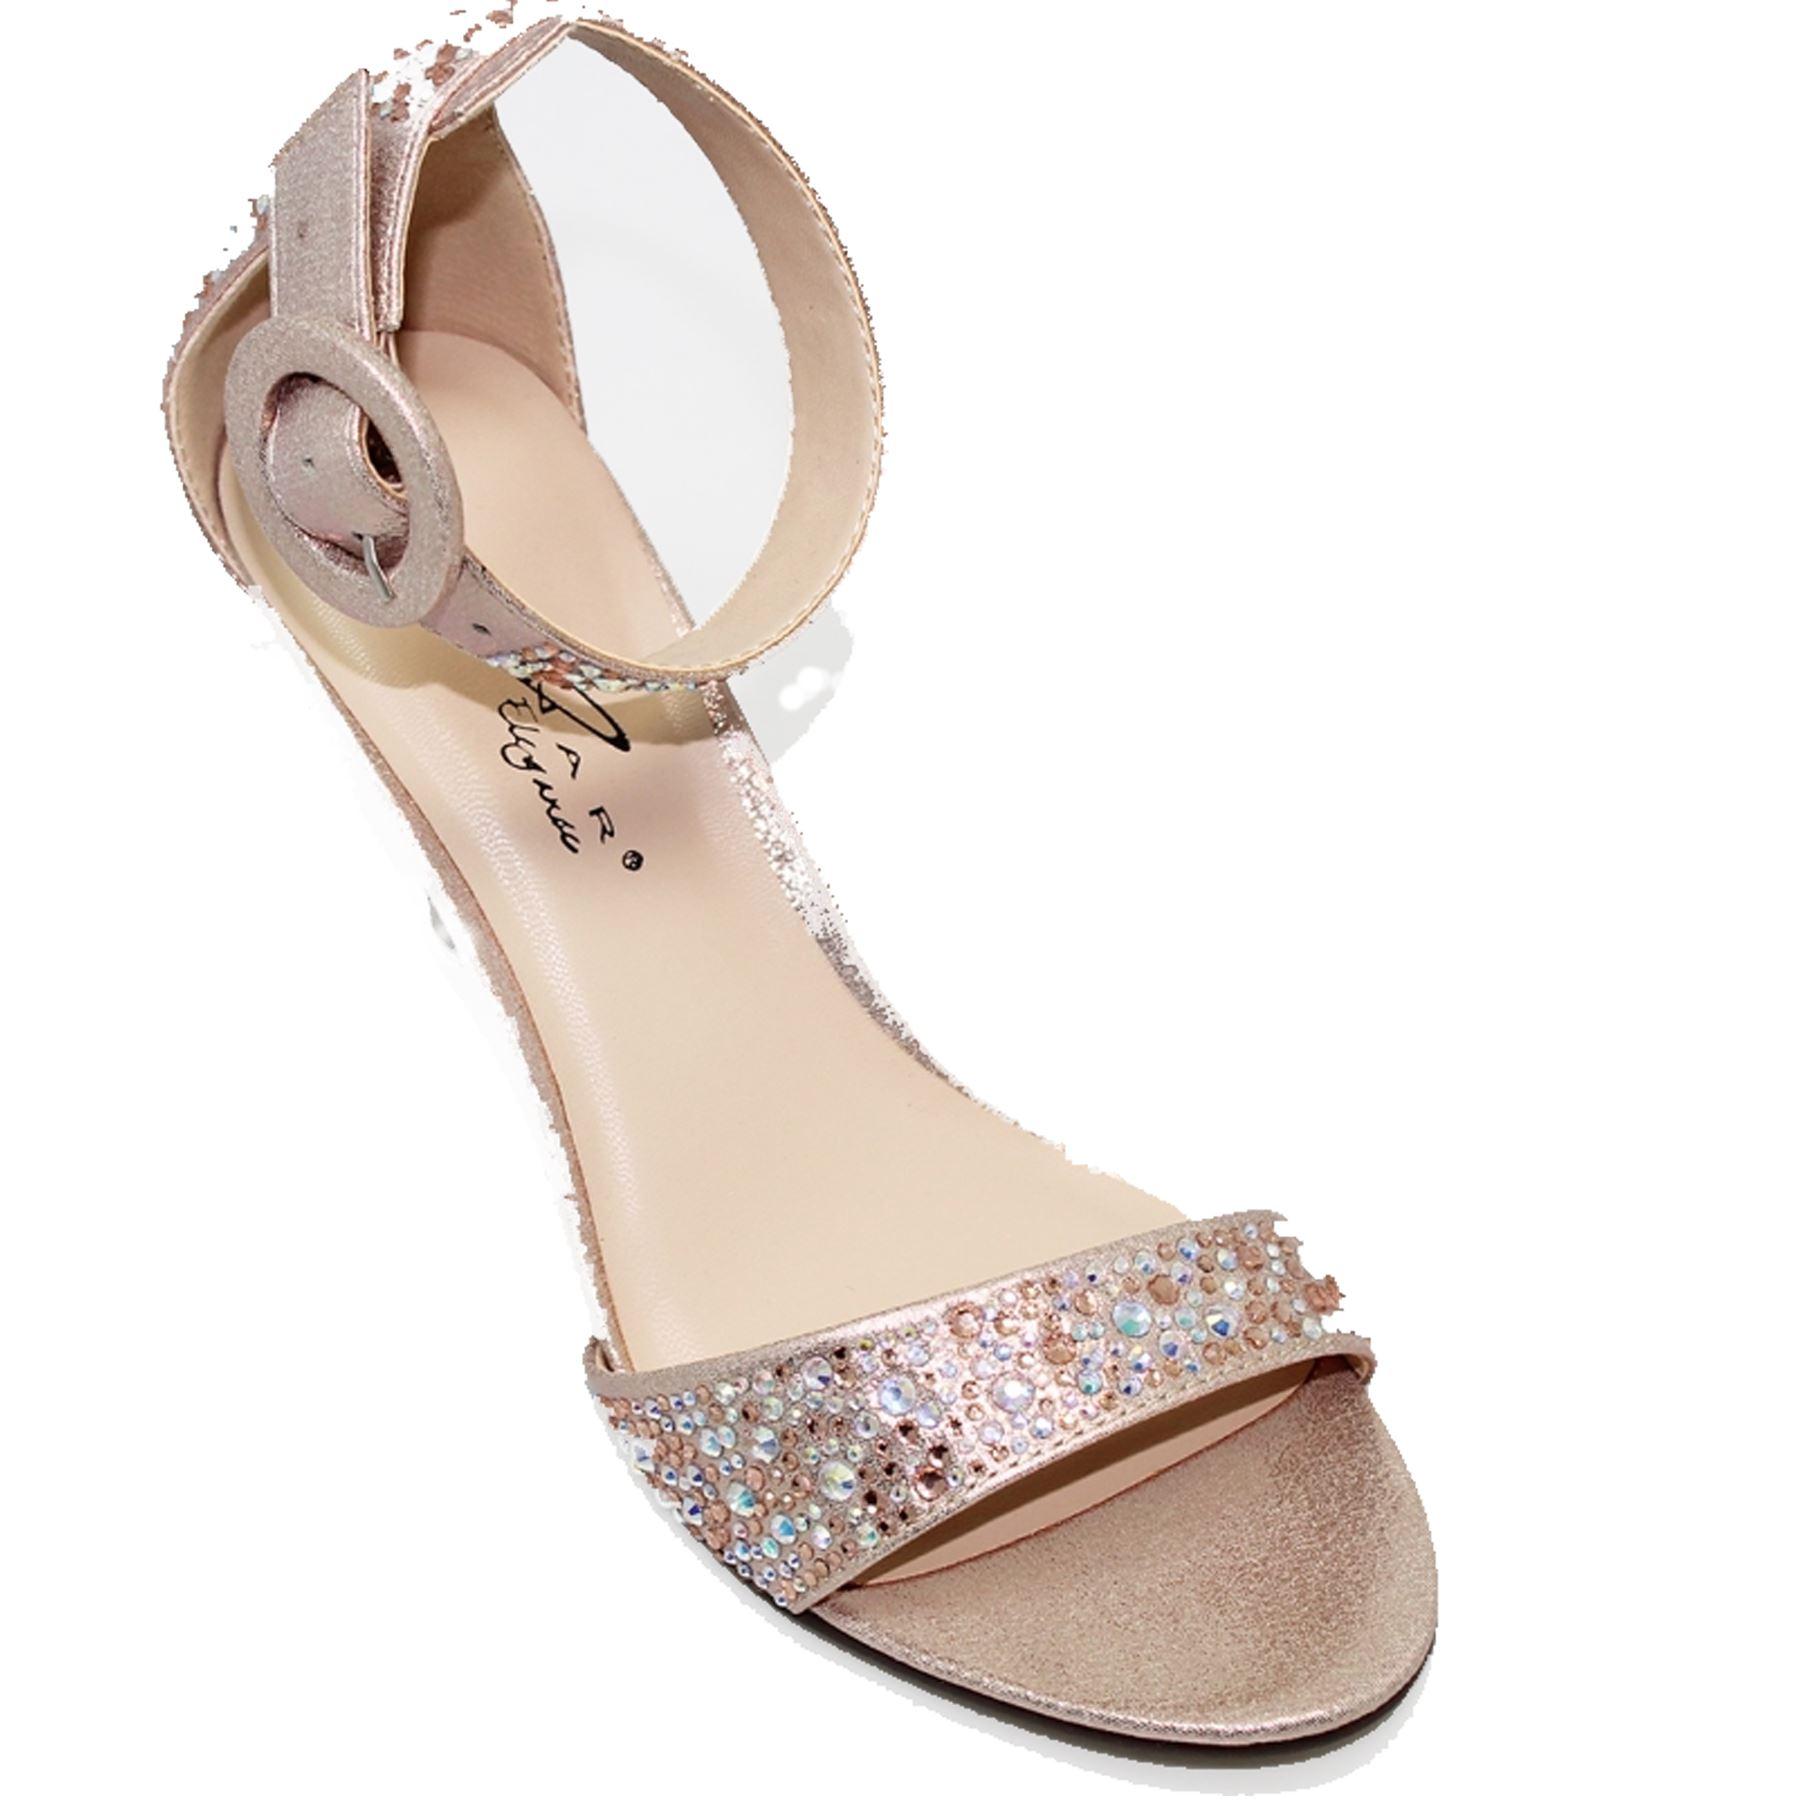 FLR491 Peep Selina Metallic Faux Leather Ankle Strap Peep FLR491 Toe Gemstone Heels Bag 4a639e